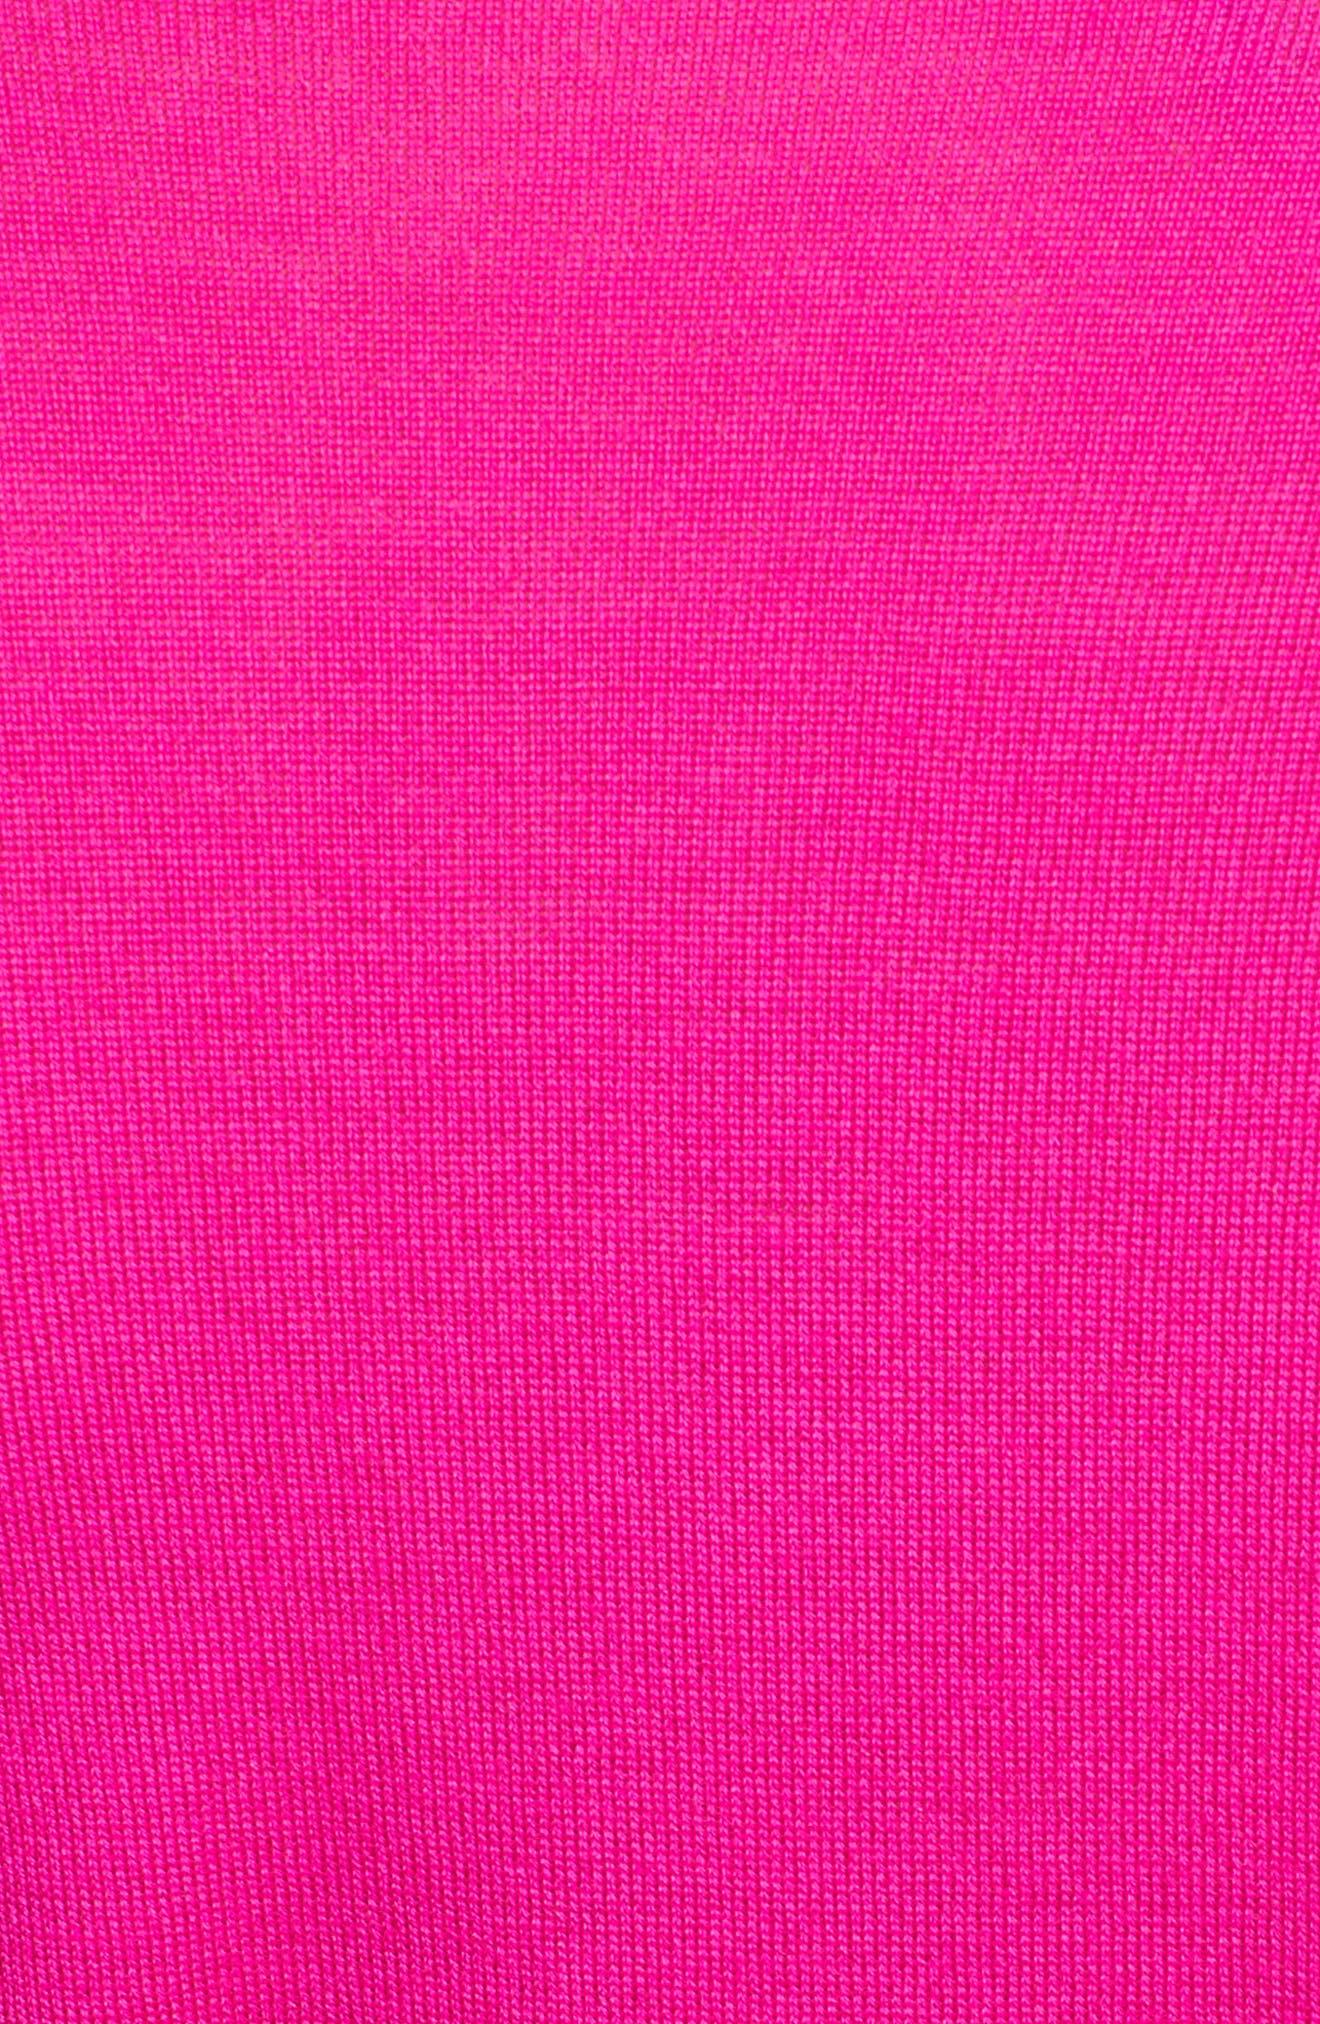 Plunging V-Neck Merino Wool Sweater,                             Alternate thumbnail 5, color,                             656